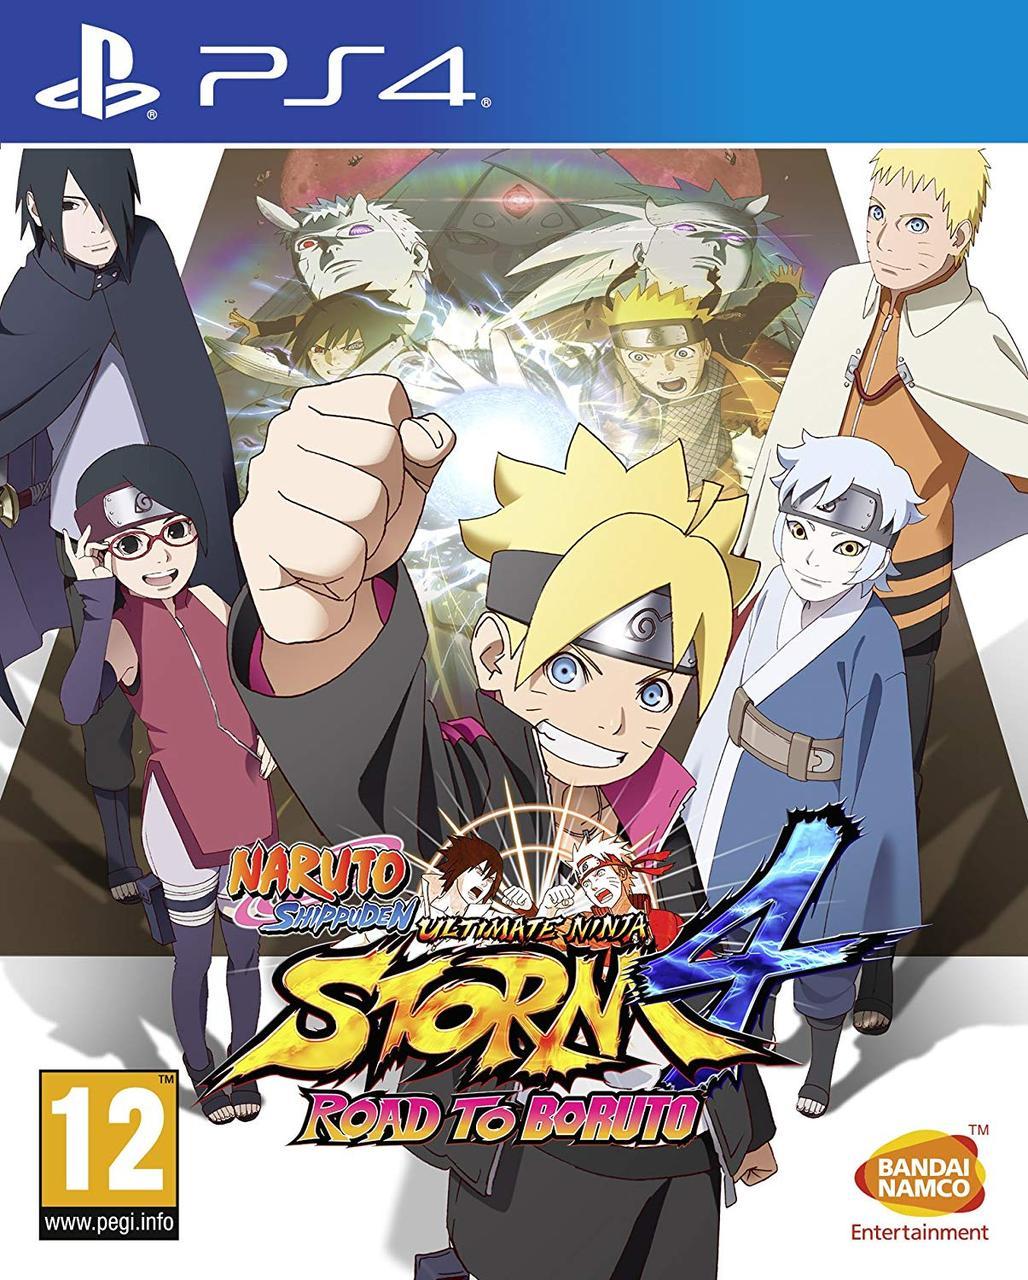 Naruto Shippuden Ultimate Ninja Storm 4 Road to Boruto (російські субтитри) PS4